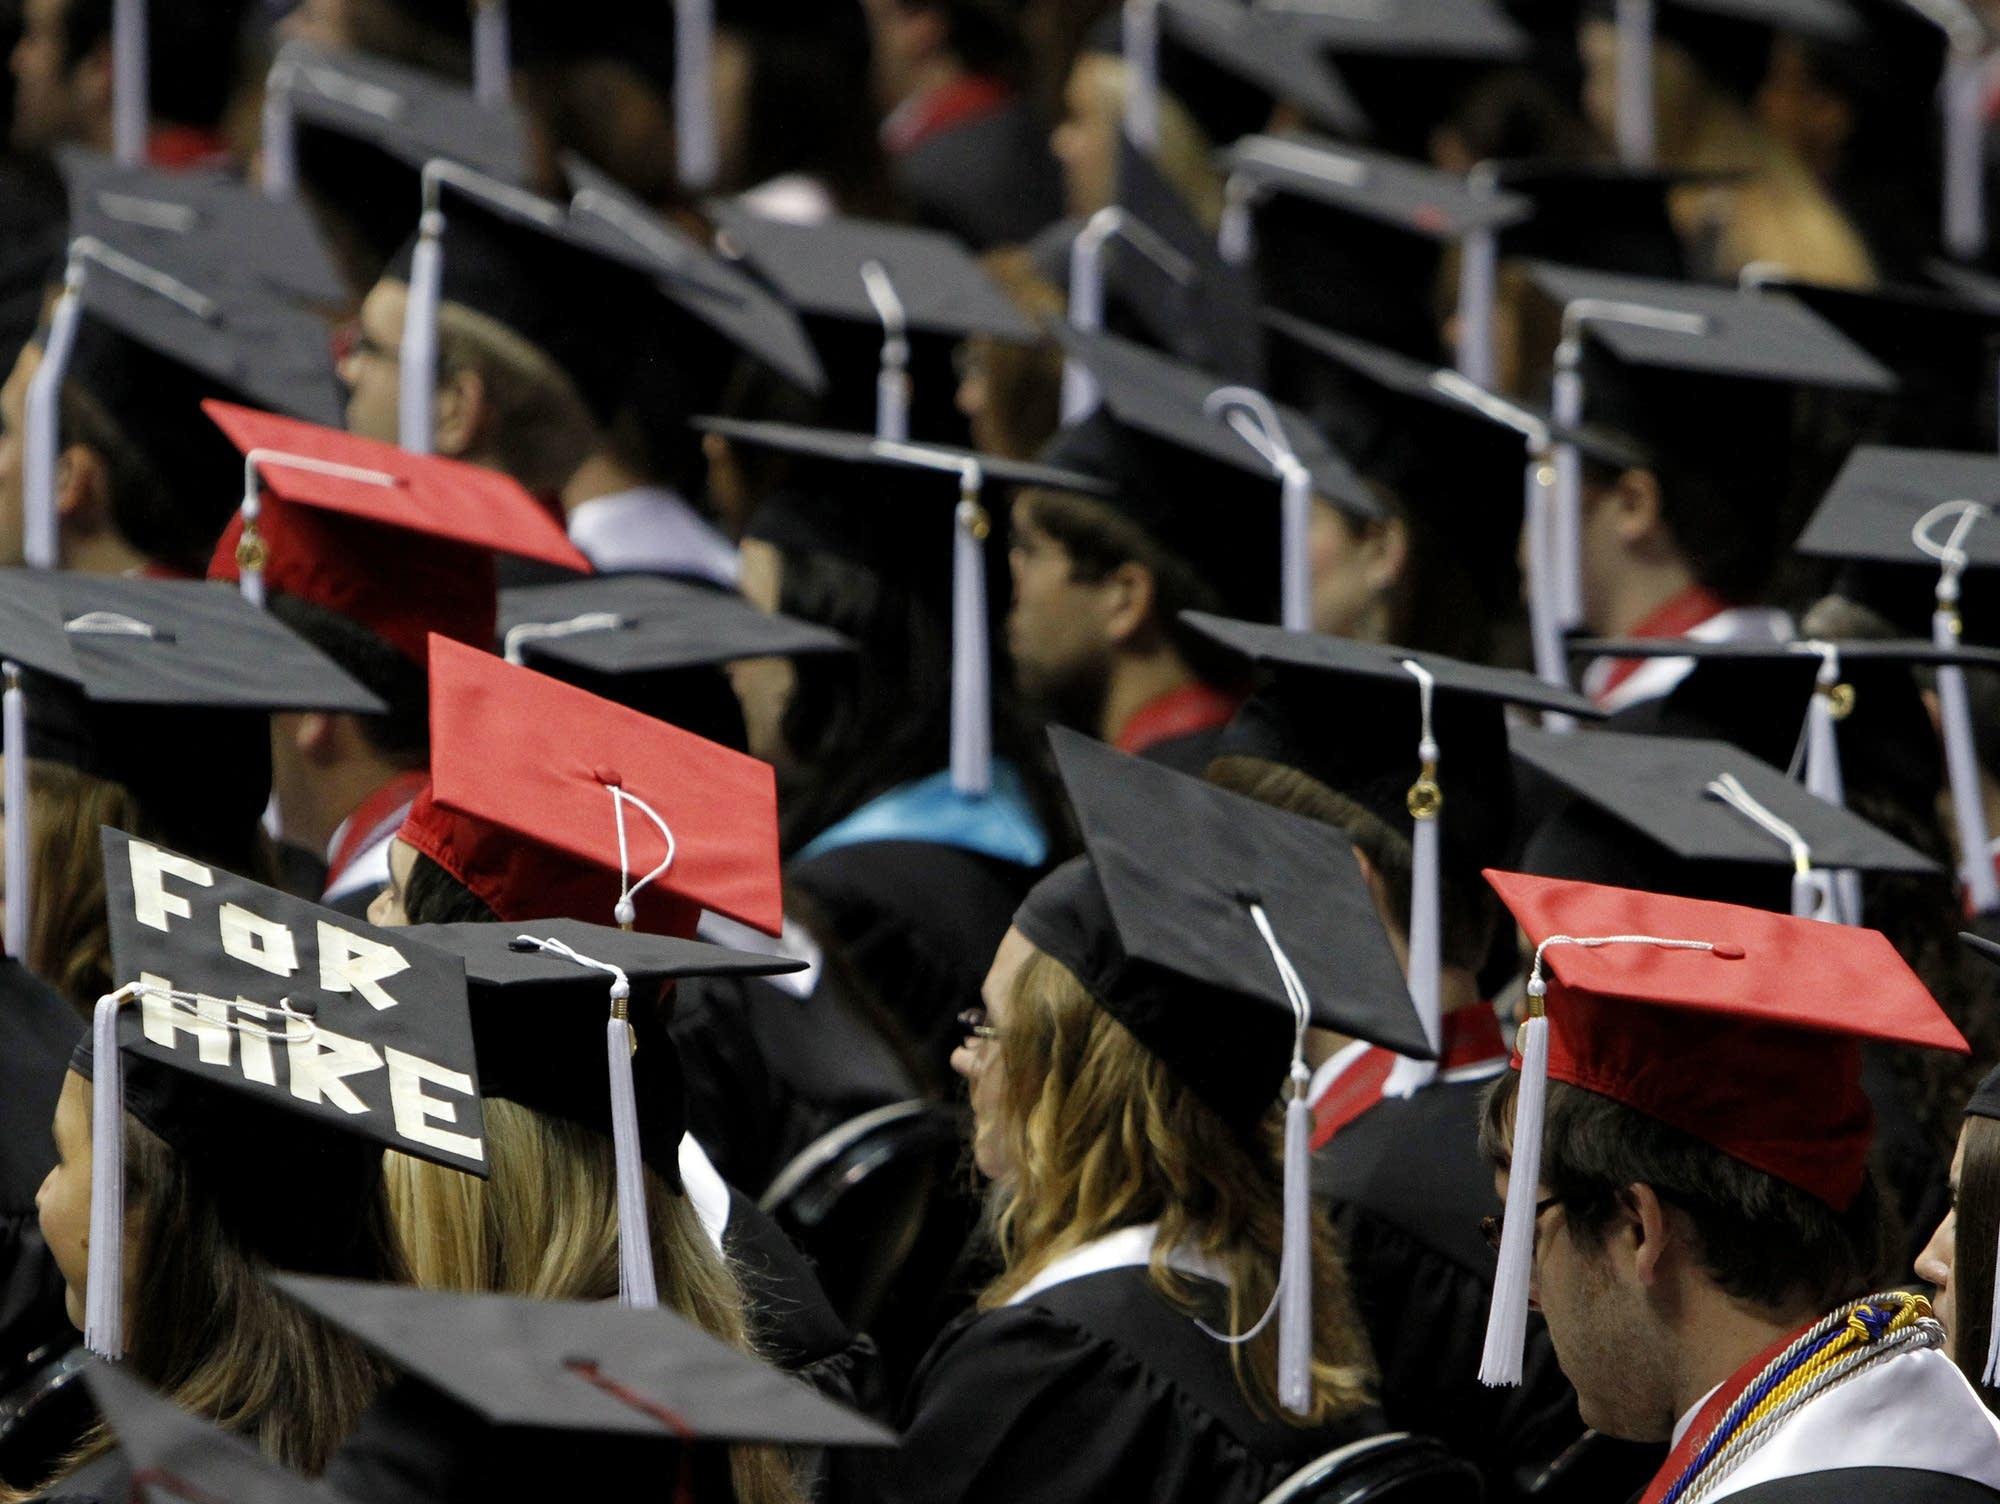 Students graduating at the University of Alabama in Tuscaloosa, Ala.